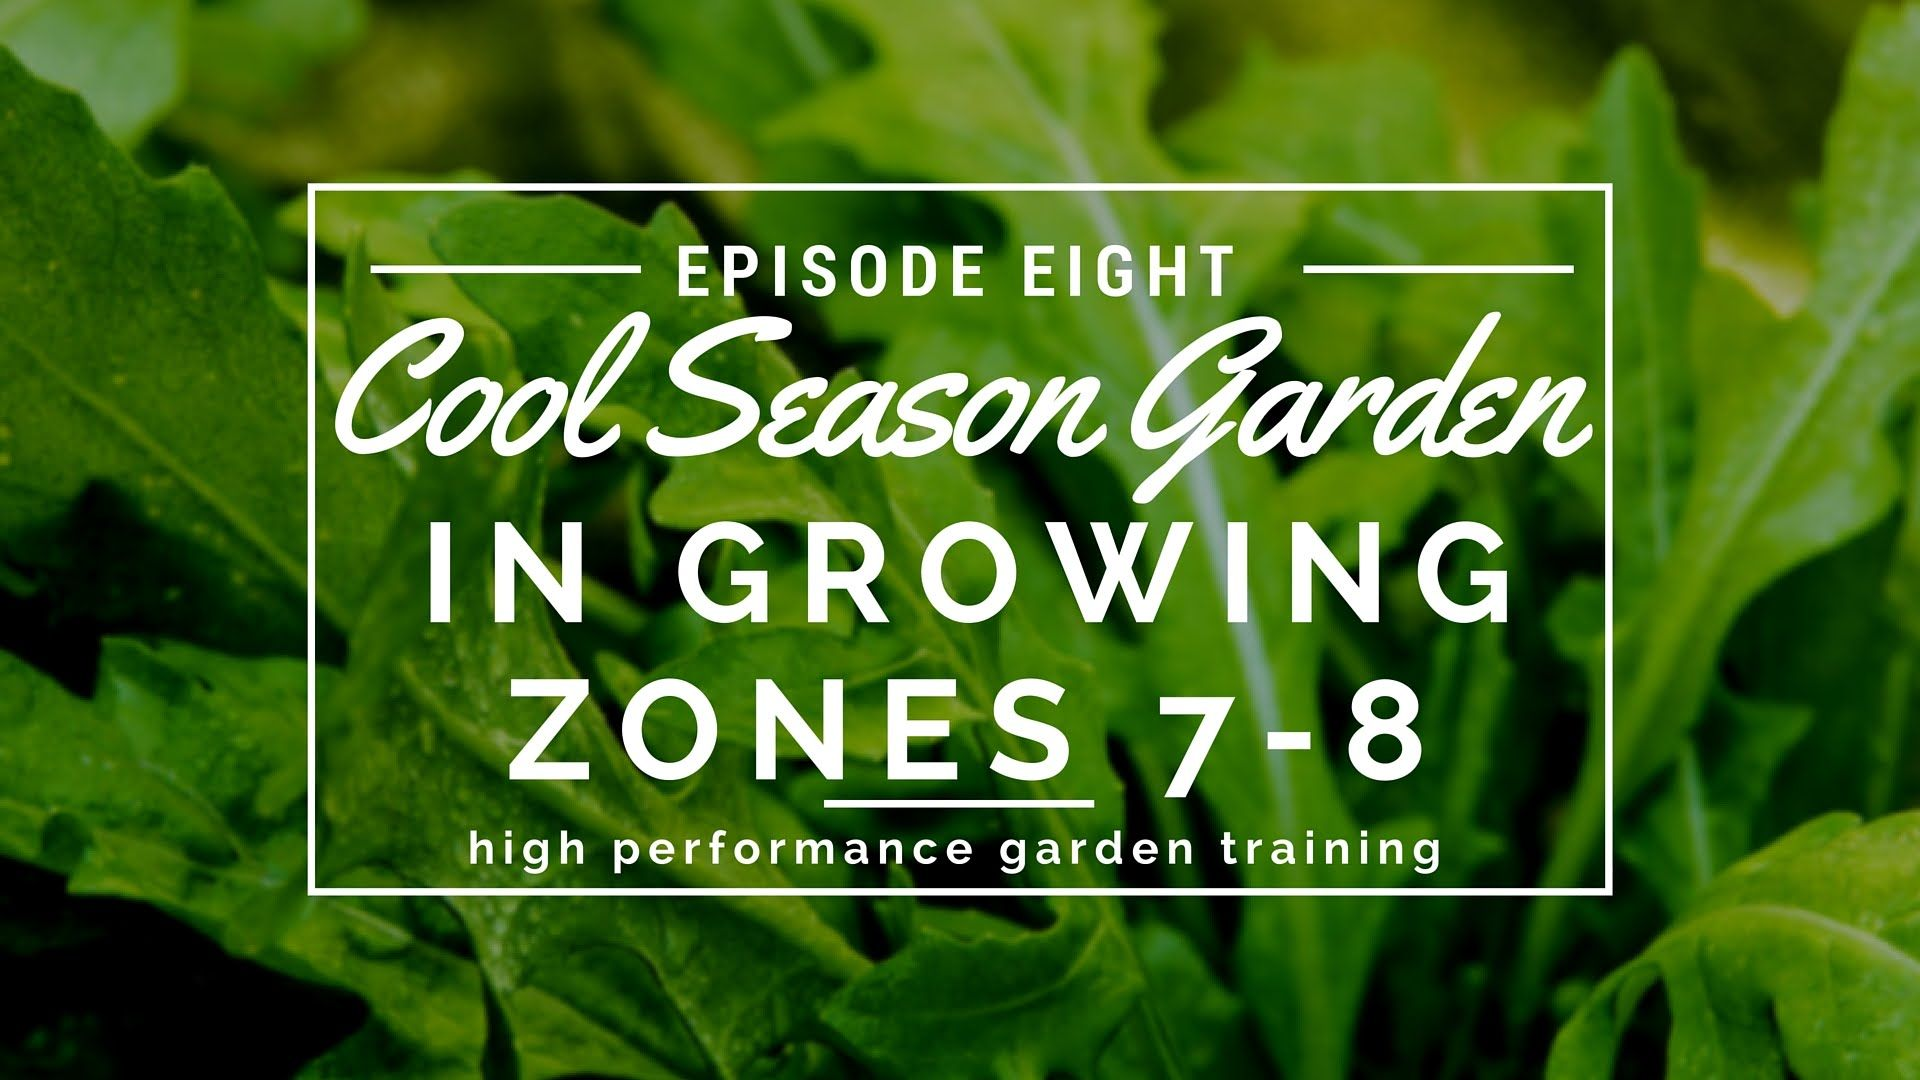 d894642f8b770f83825e6b4503dd5a3e - What Gardening Zone Is Westchester Ny